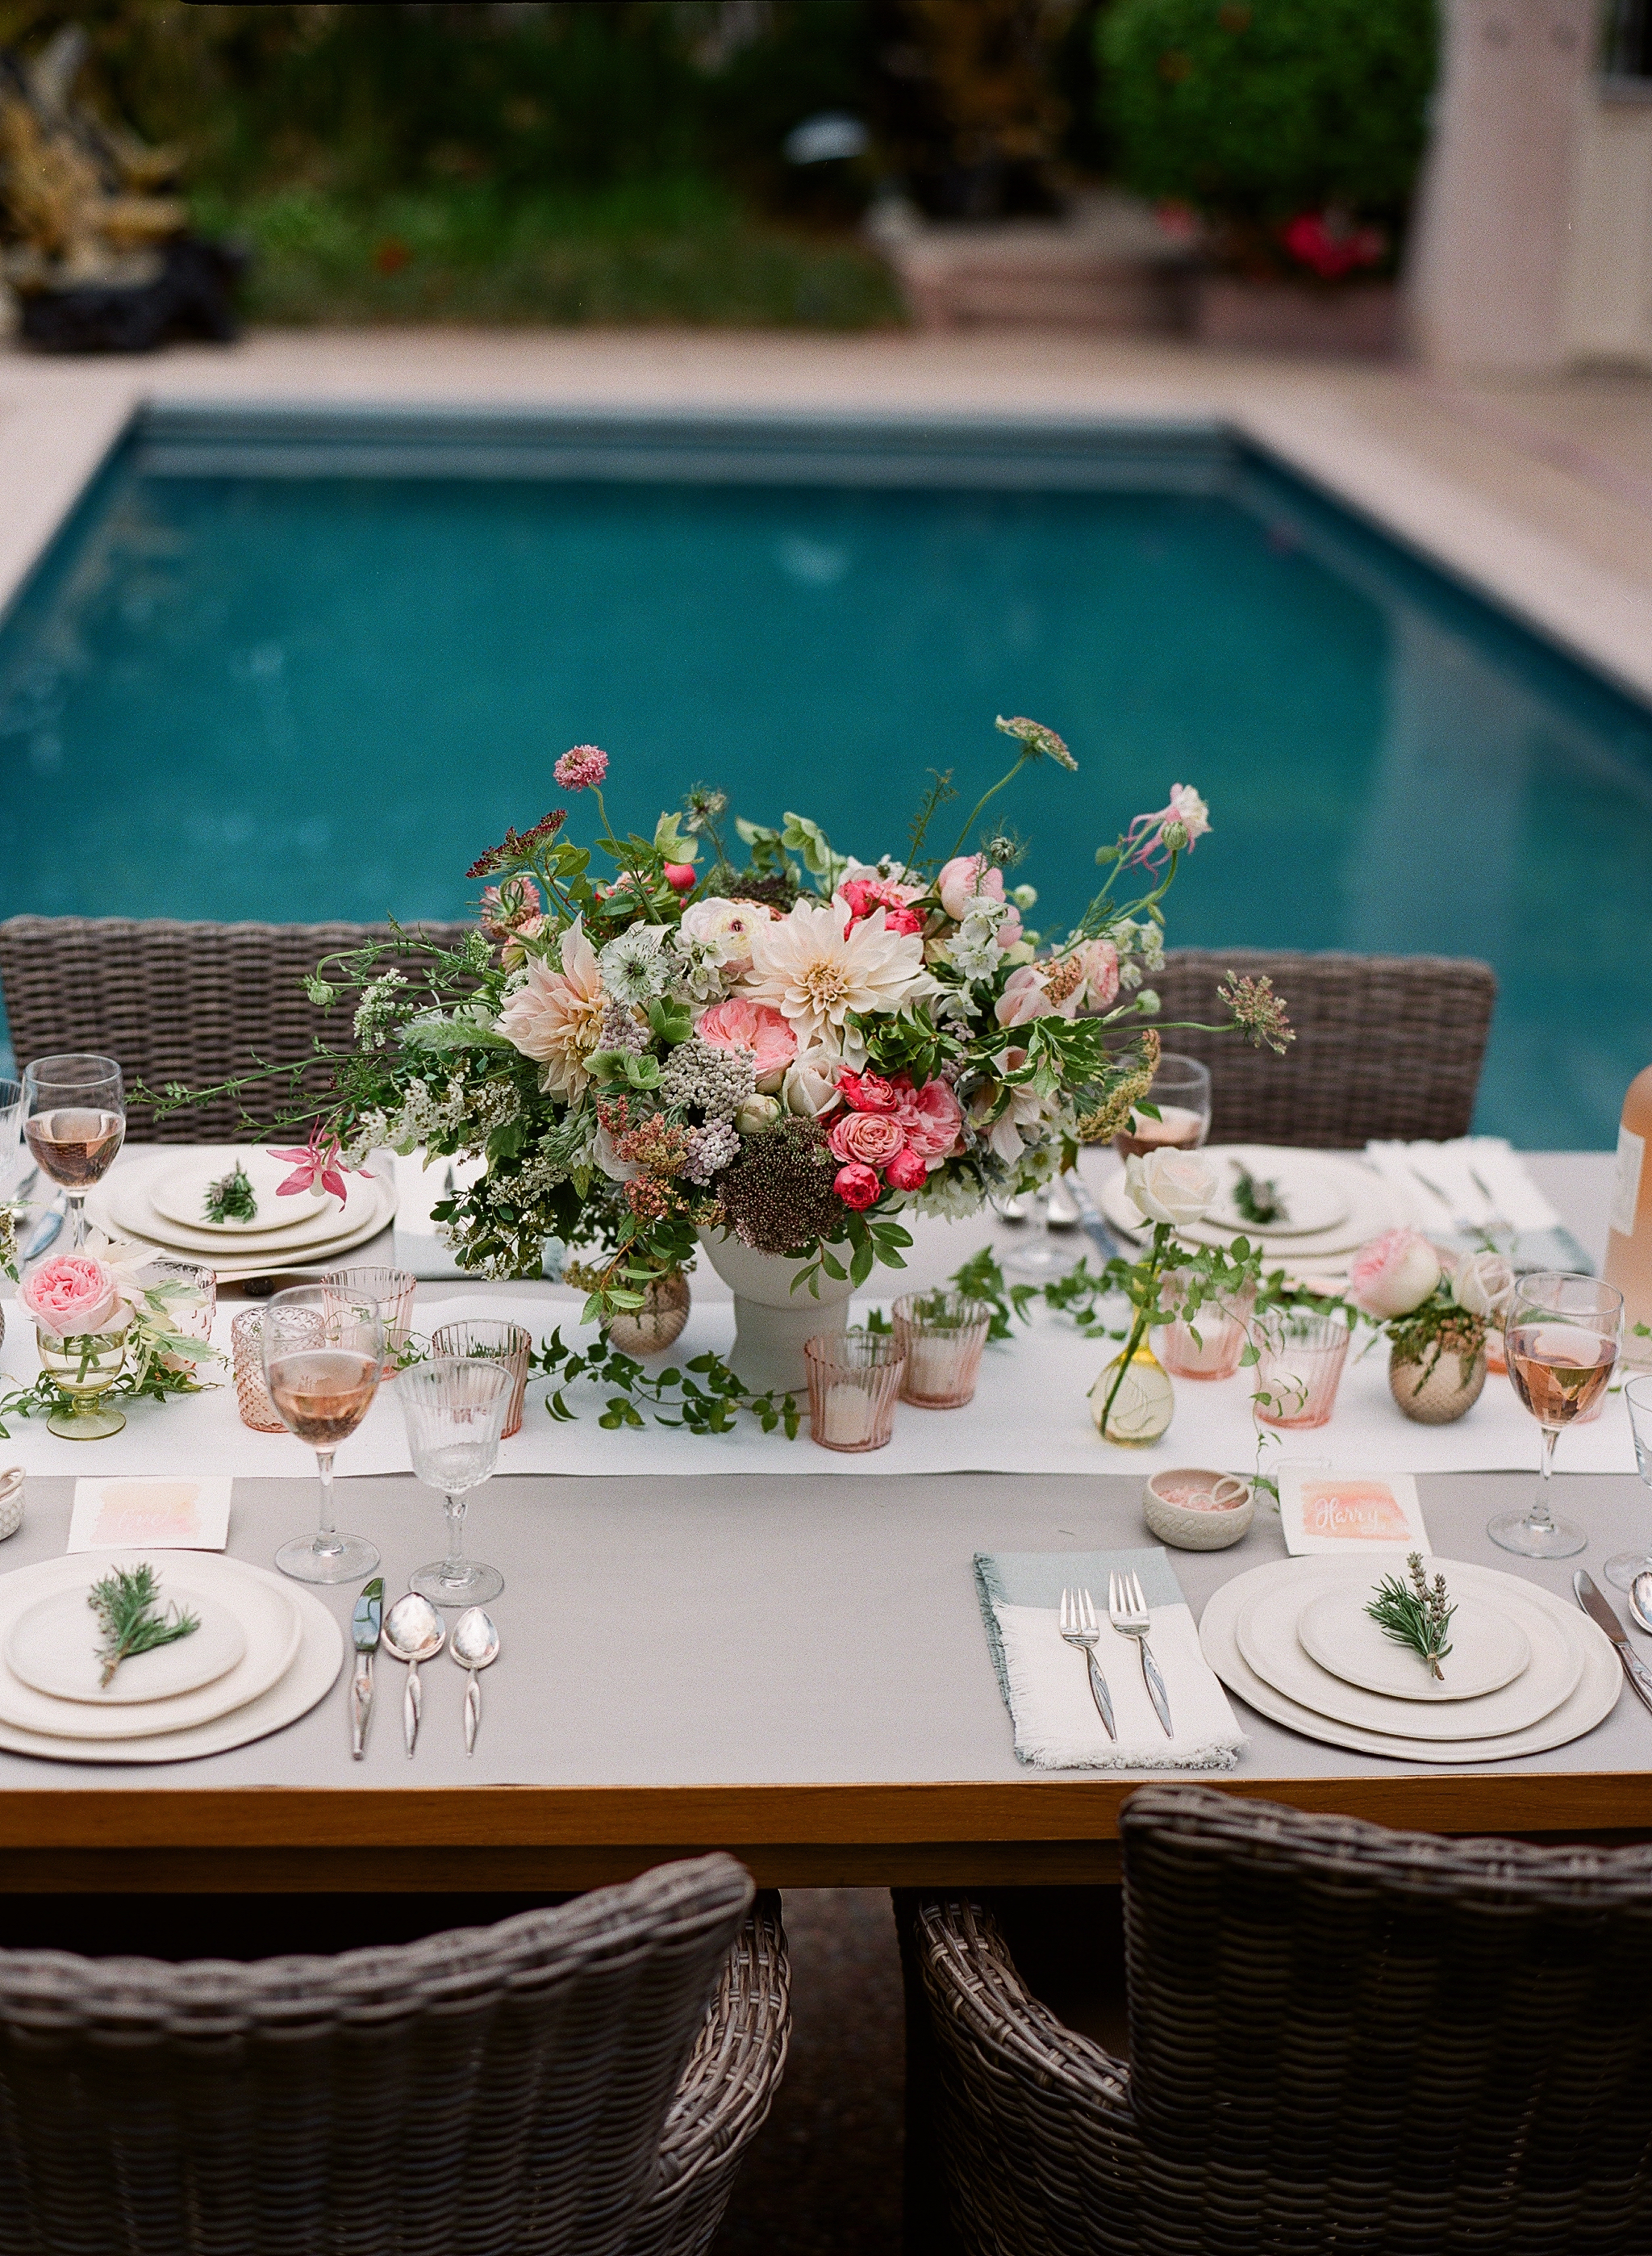 www.santabarbarawedding.com | Megan Sorel Photography | Reception Table